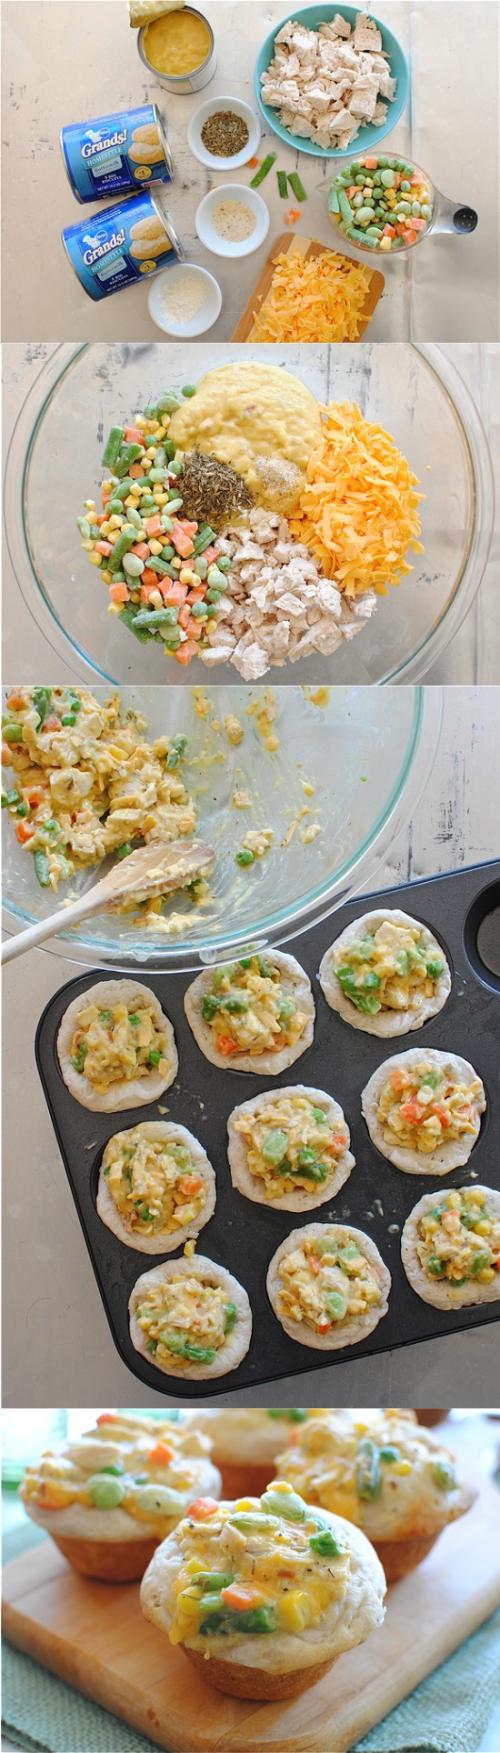 joysama images: Chicken Pot Pie Cupcake